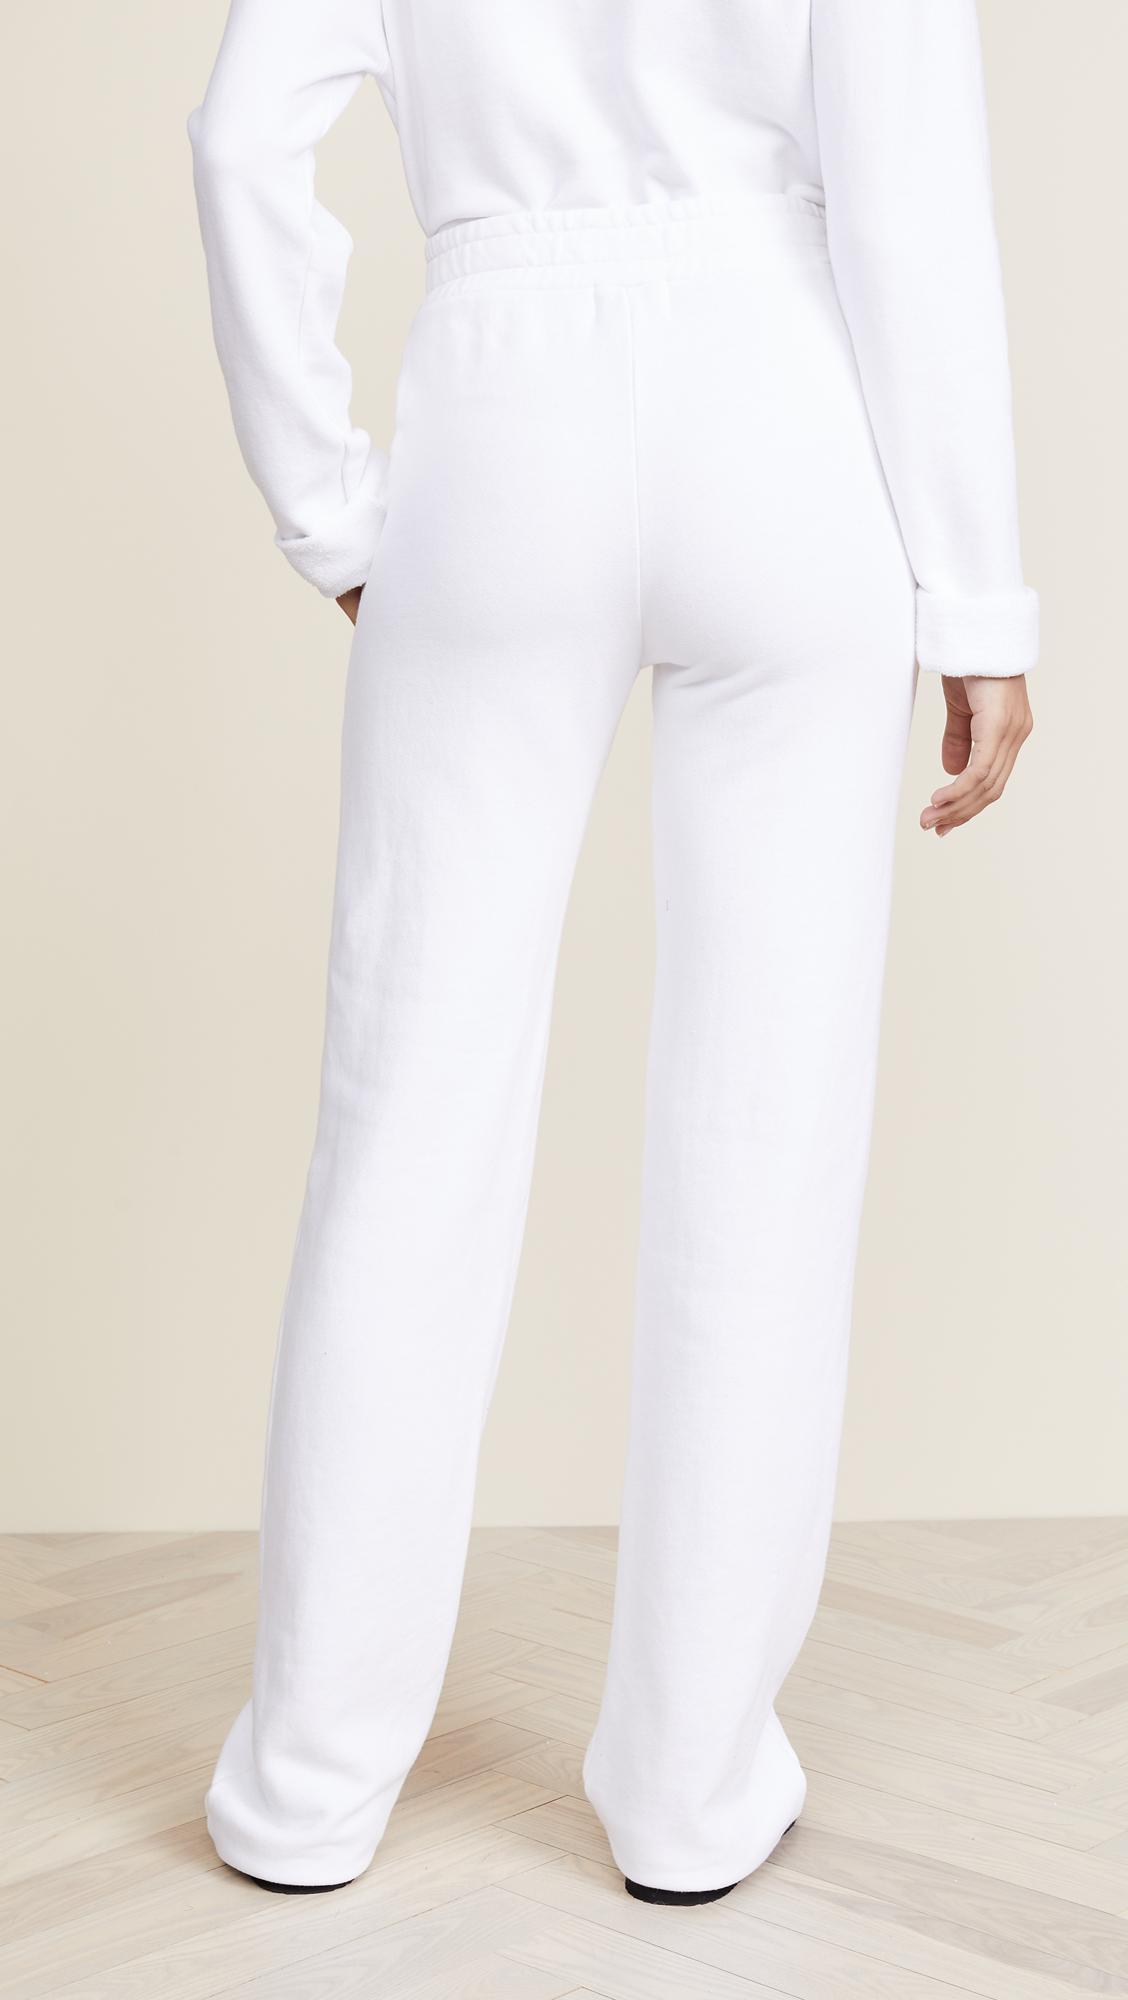 TROUSERS - Casual trousers Cotton Citizen 15sRF0ysZ